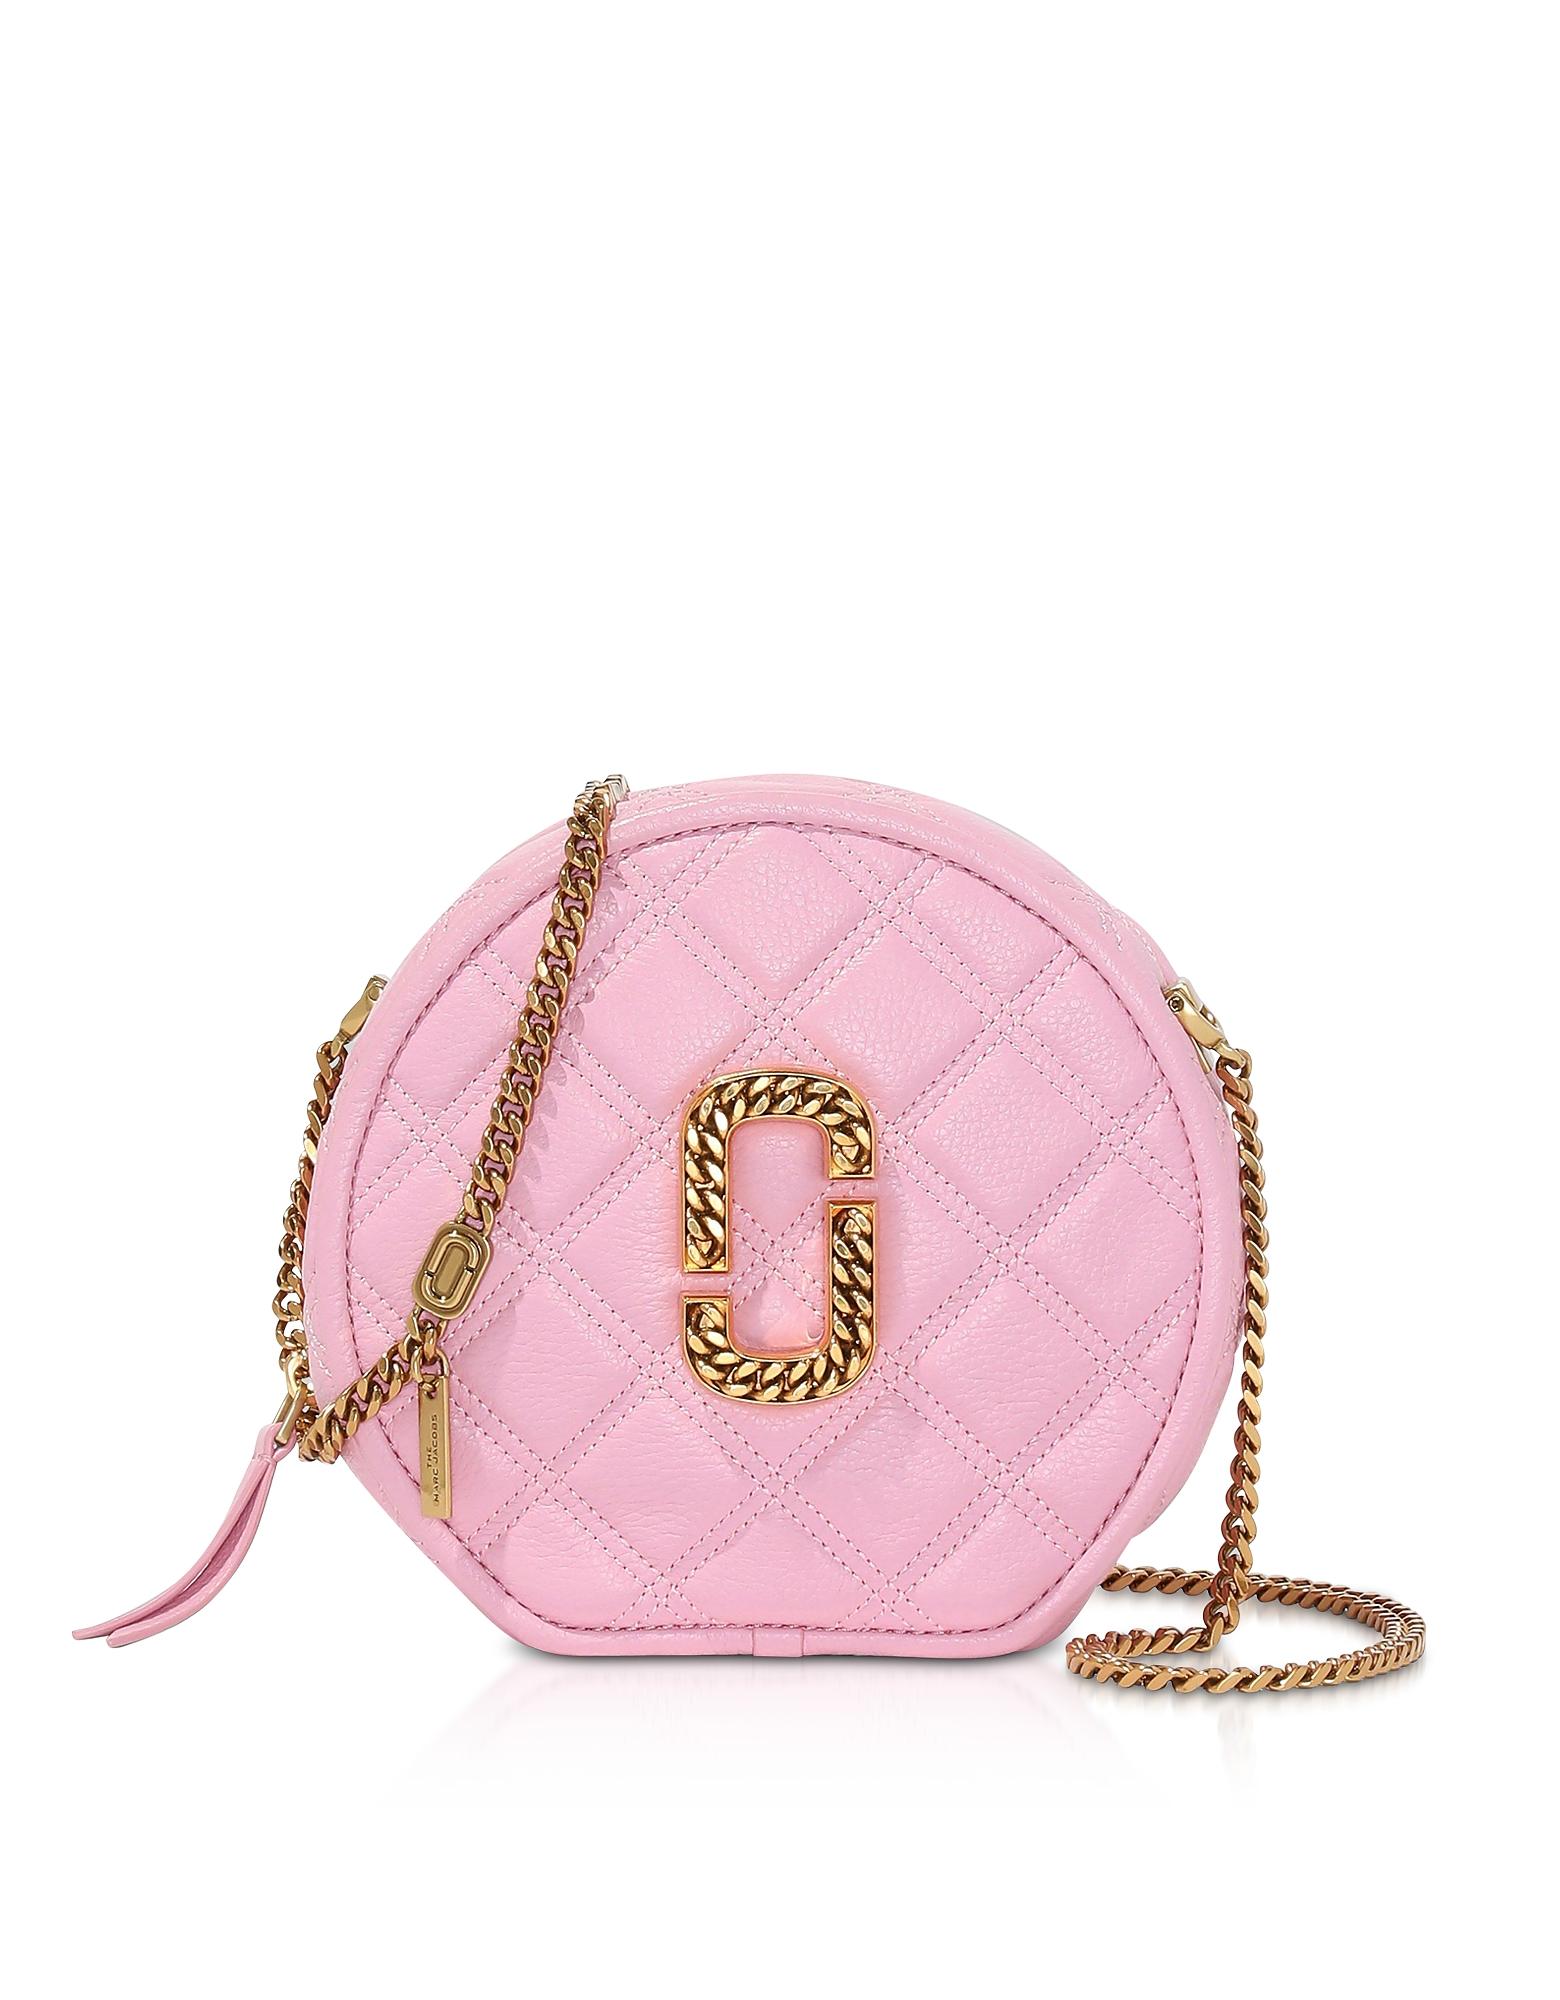 Marc Jacobs Designer Handbags, Leather The Status Round Crossbody Bag